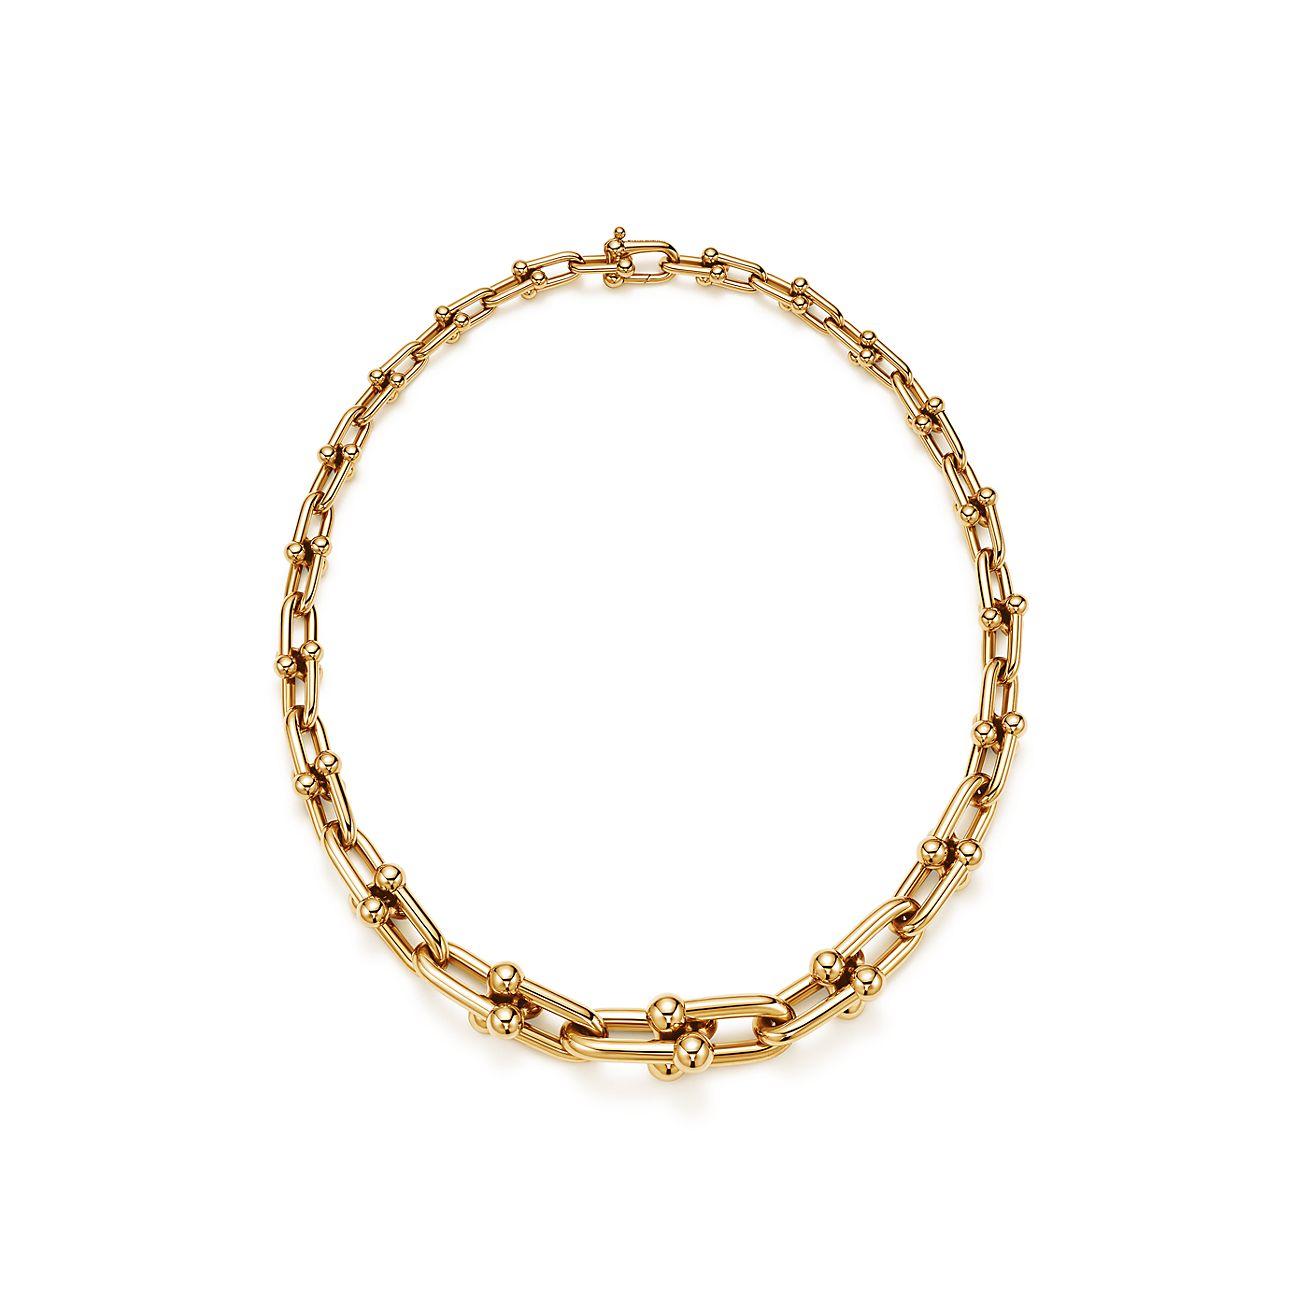 Tiffany HardWear graduated link necklace in 18k gold. | Tiffany & Co.